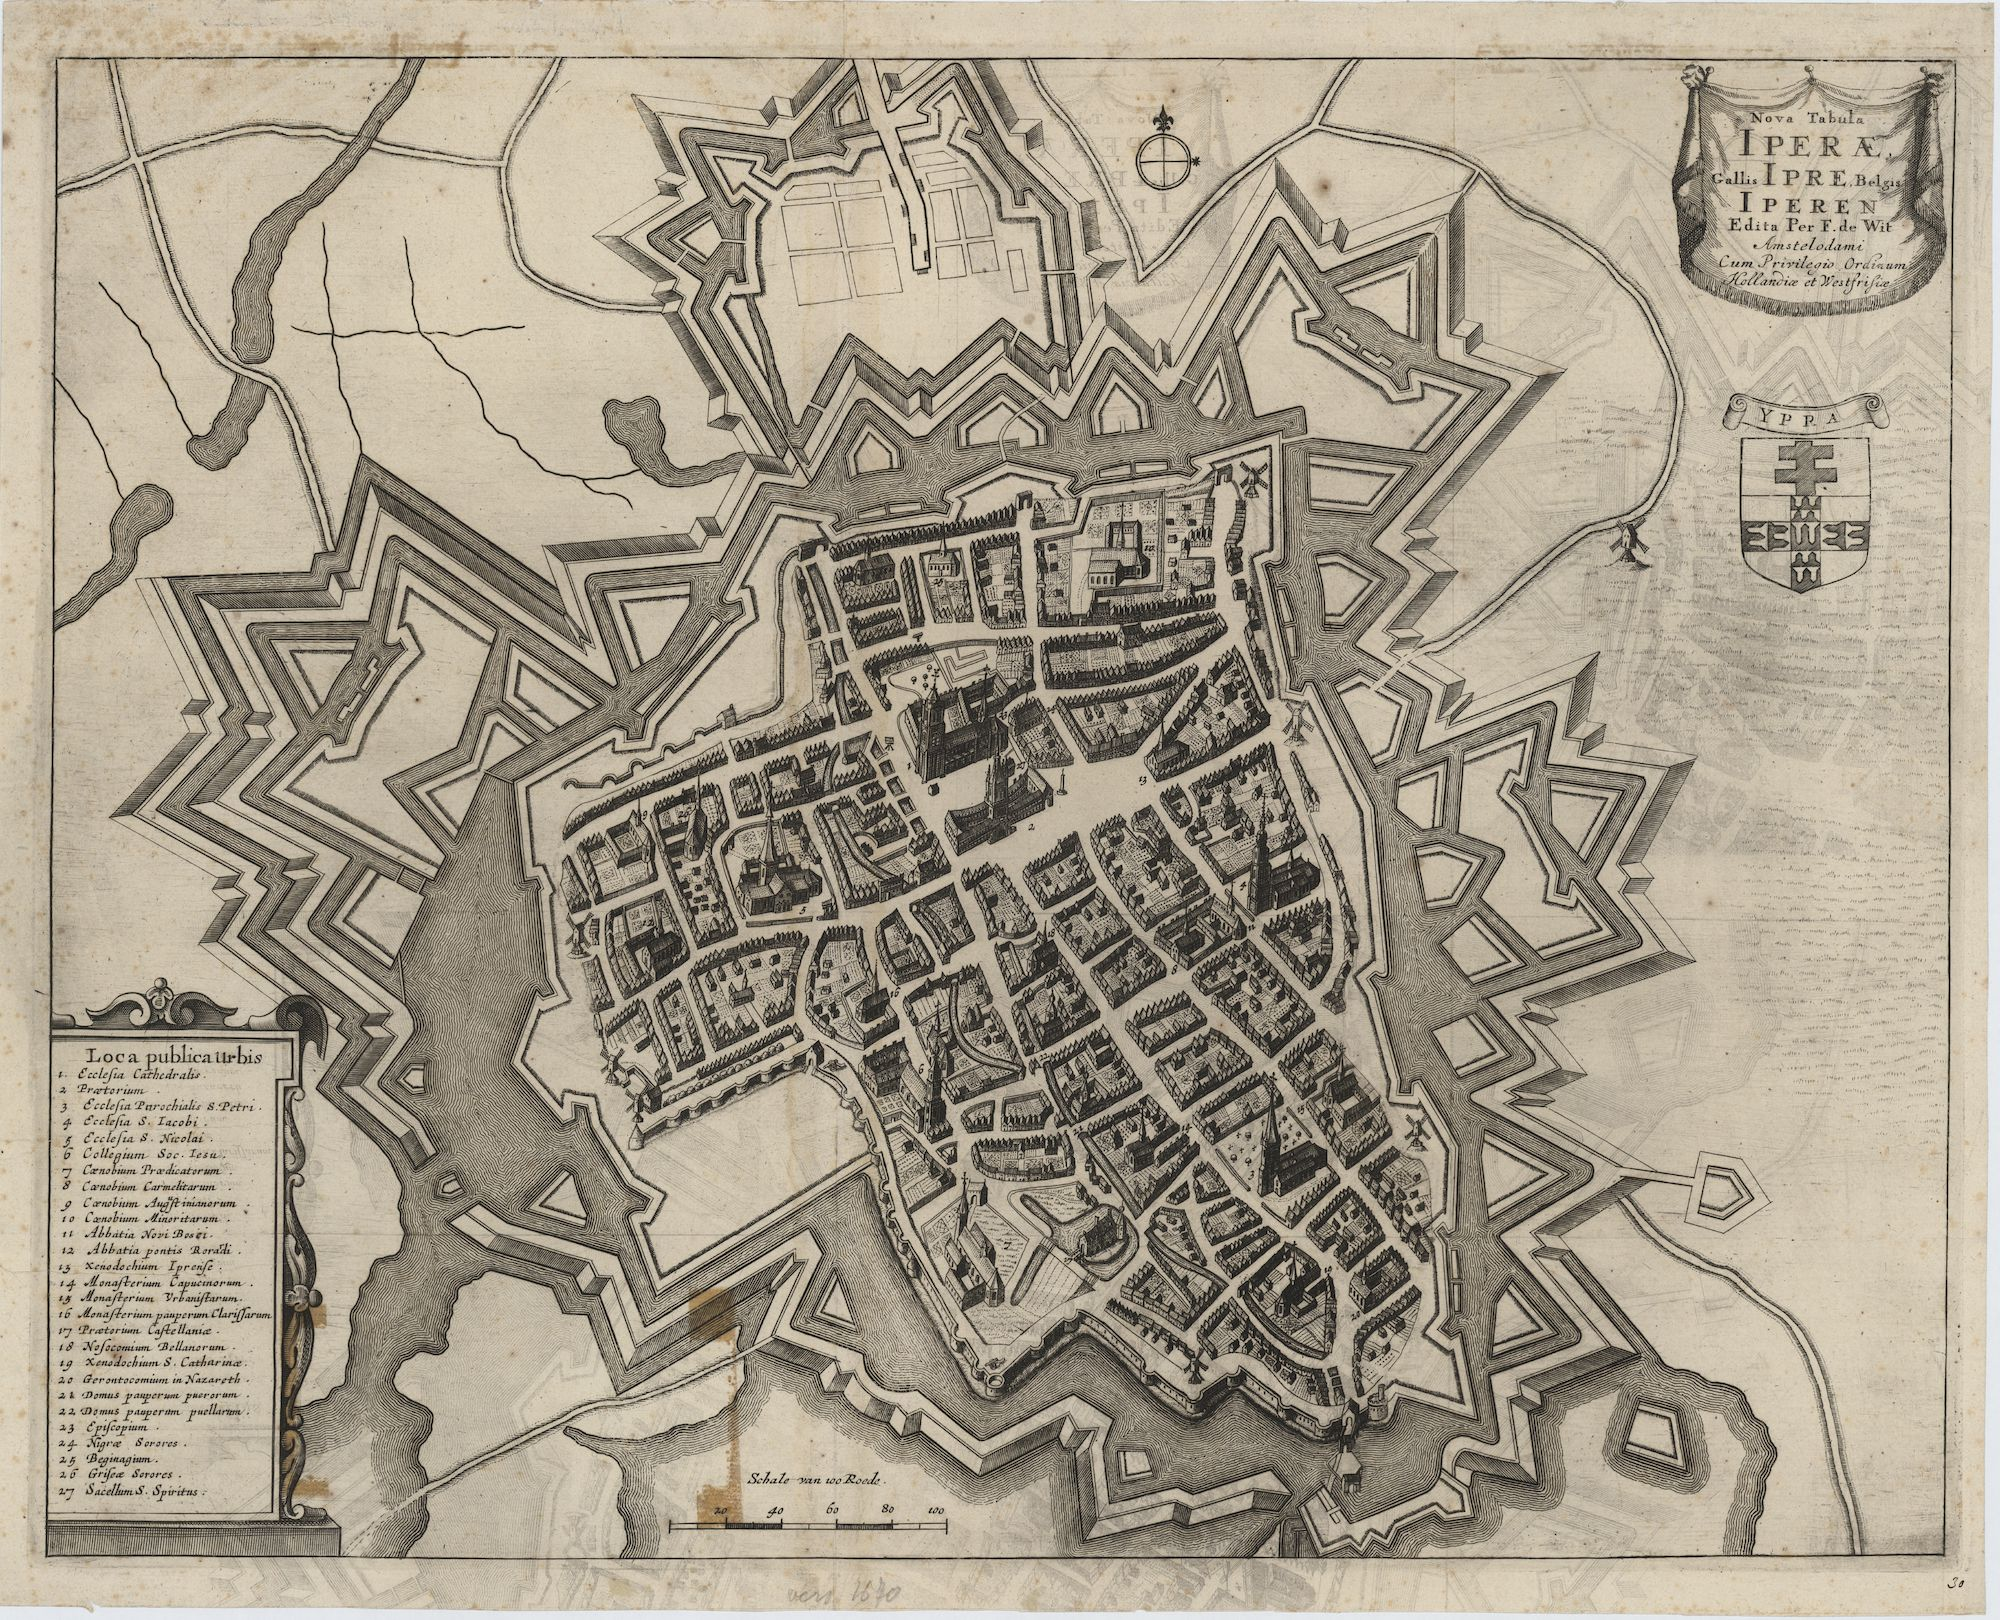 Westflandrica - Iper, stadsplan